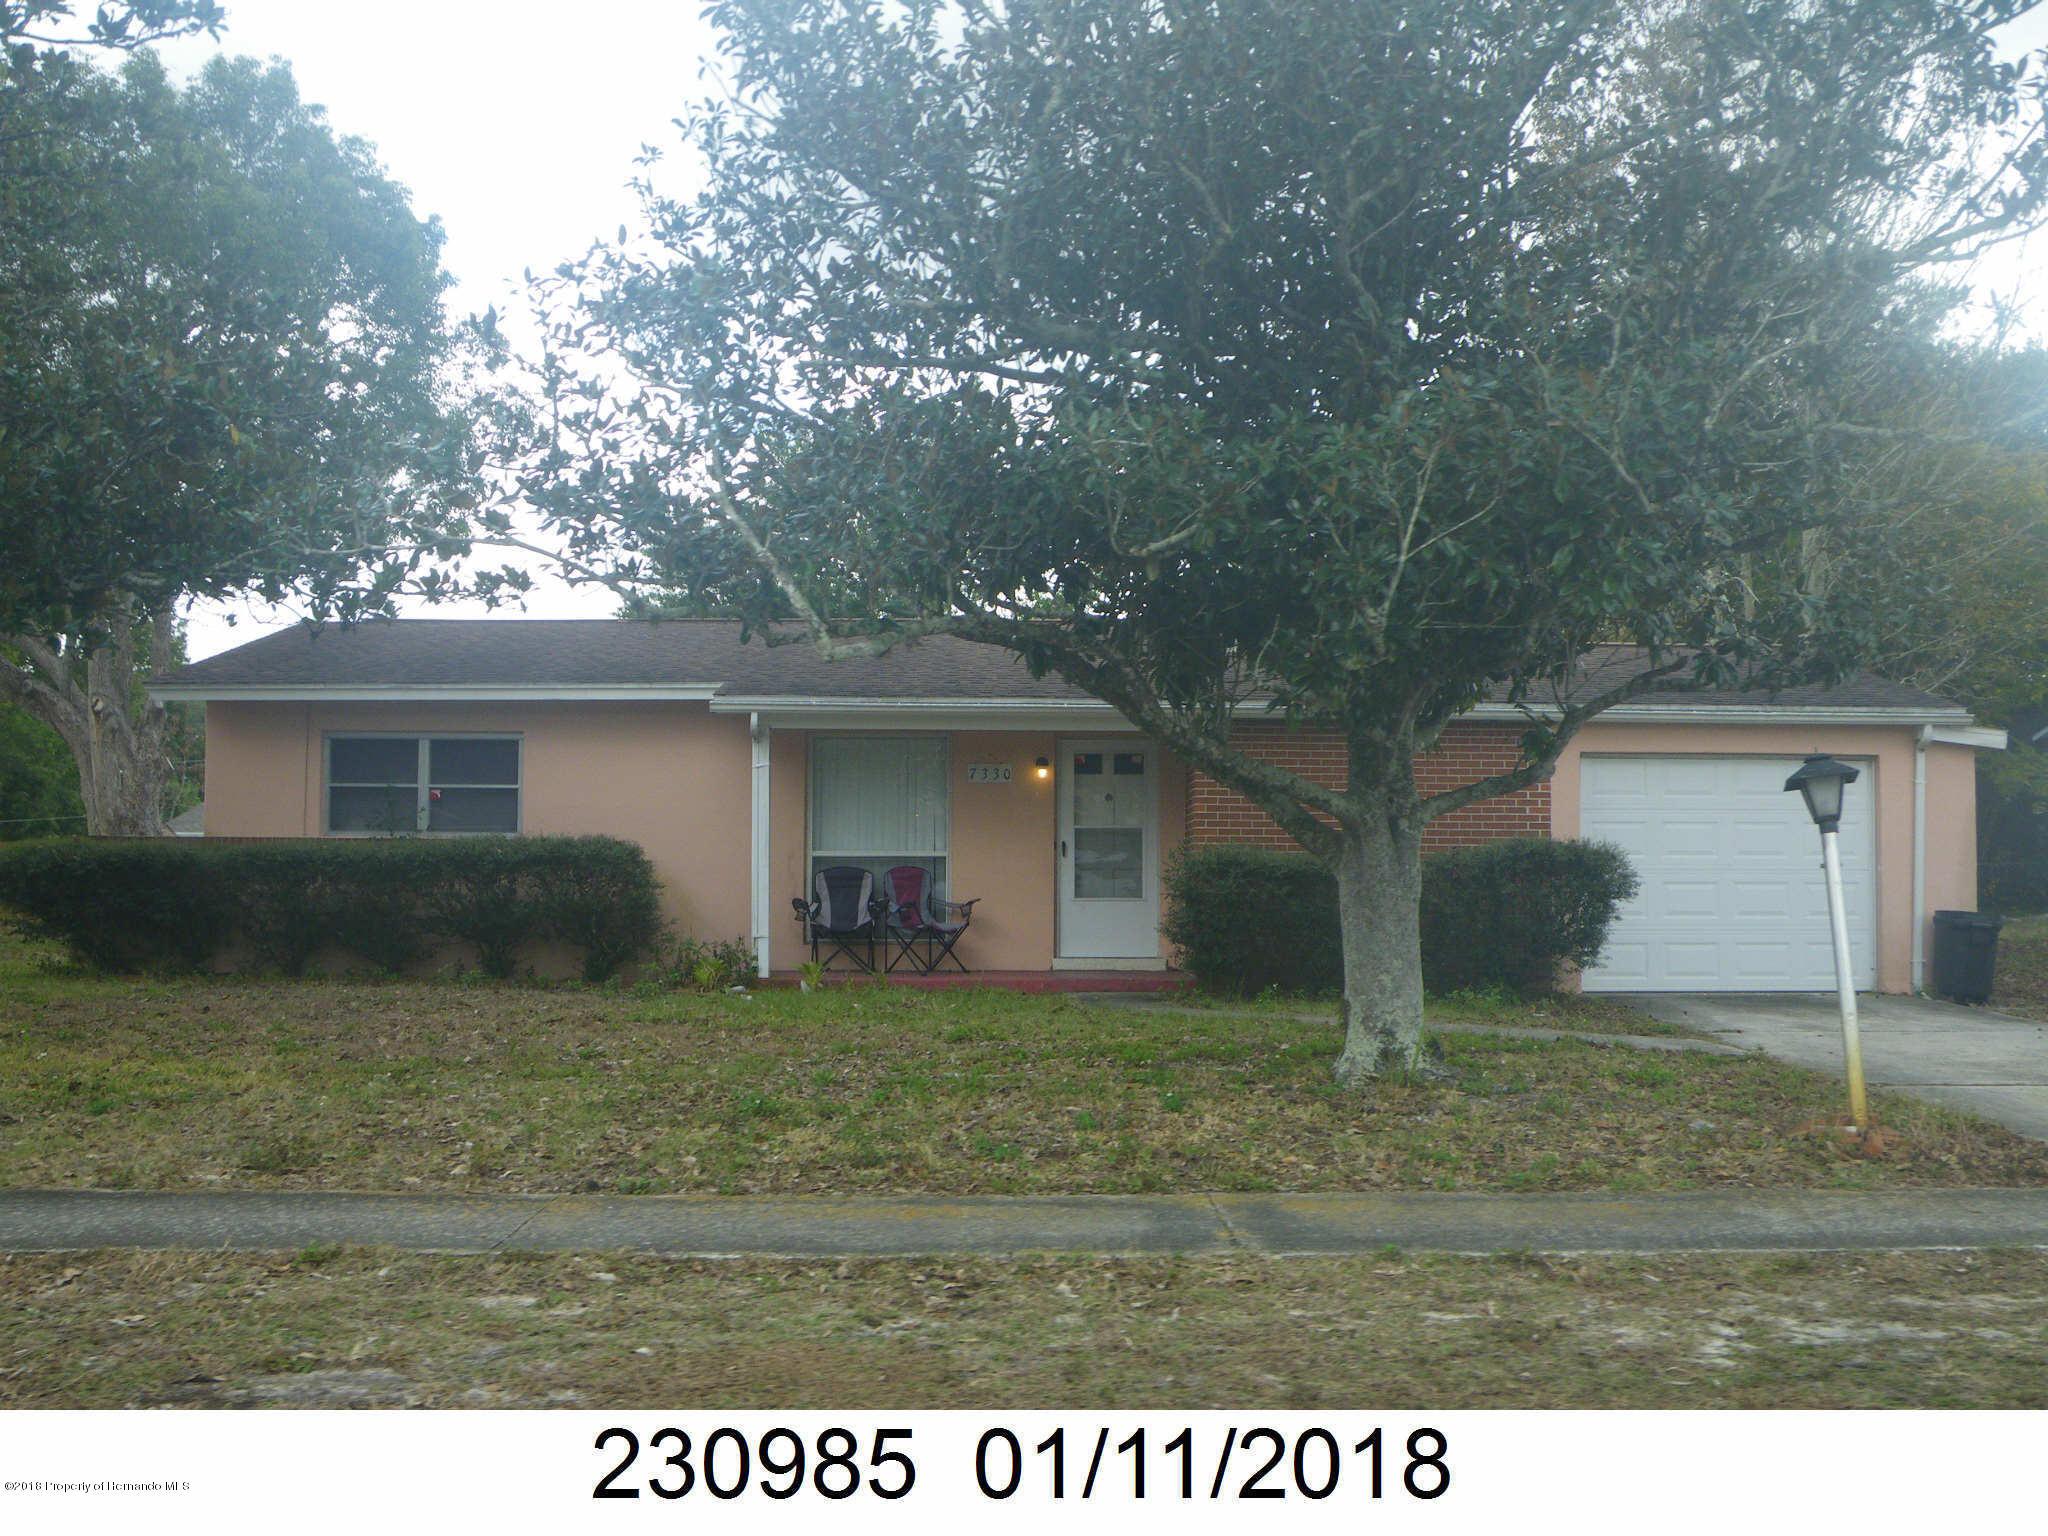 7330 Pinehurst Drive, Spring Hill, Florida 34606, 2 Bedrooms Bedrooms, ,2 BathroomsBathrooms,Residential,For Sale,Pinehurst,2197426